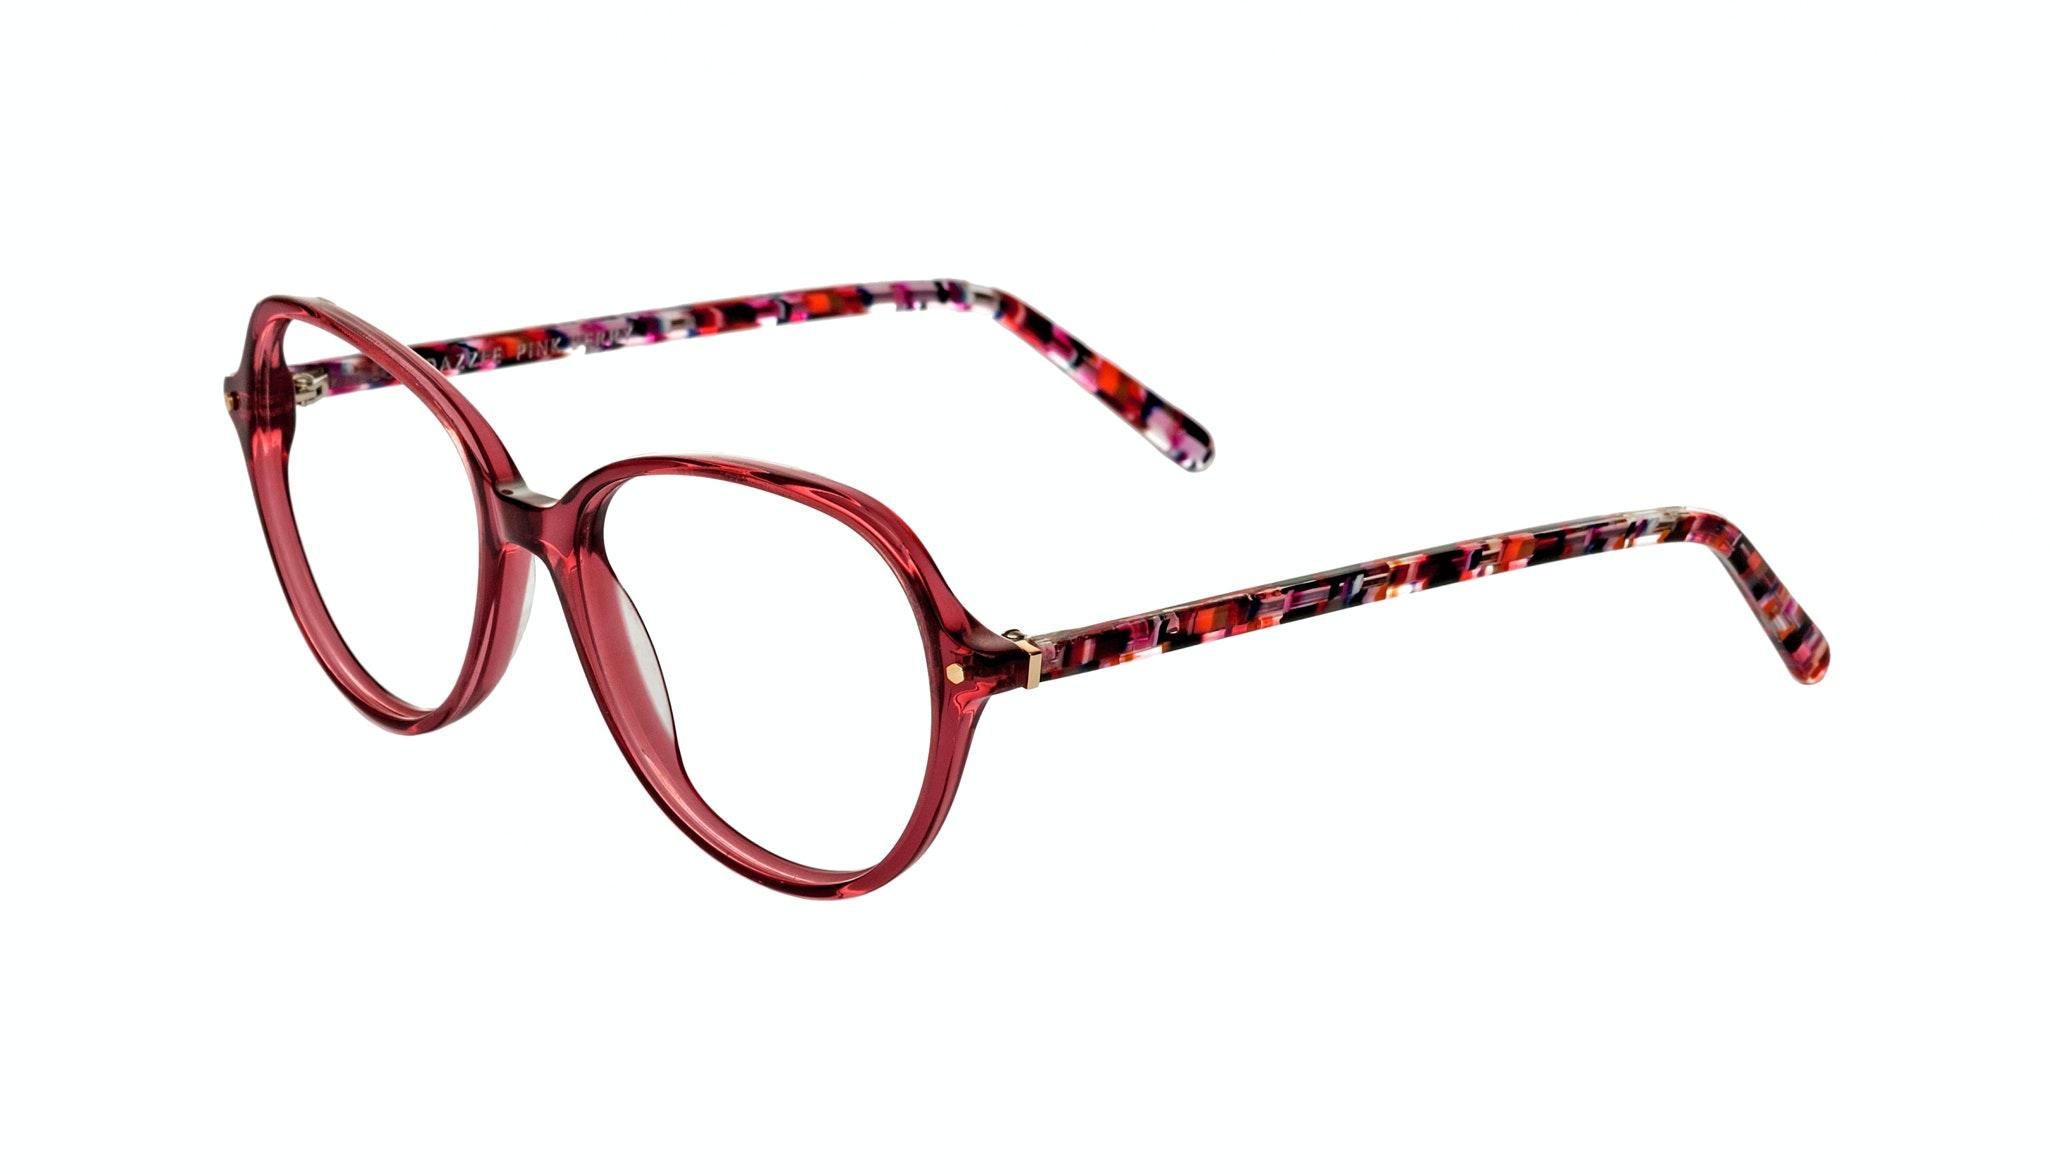 Affordable Fashion Glasses Aviator Round Eyeglasses Women Dazzle pink berry Tilt